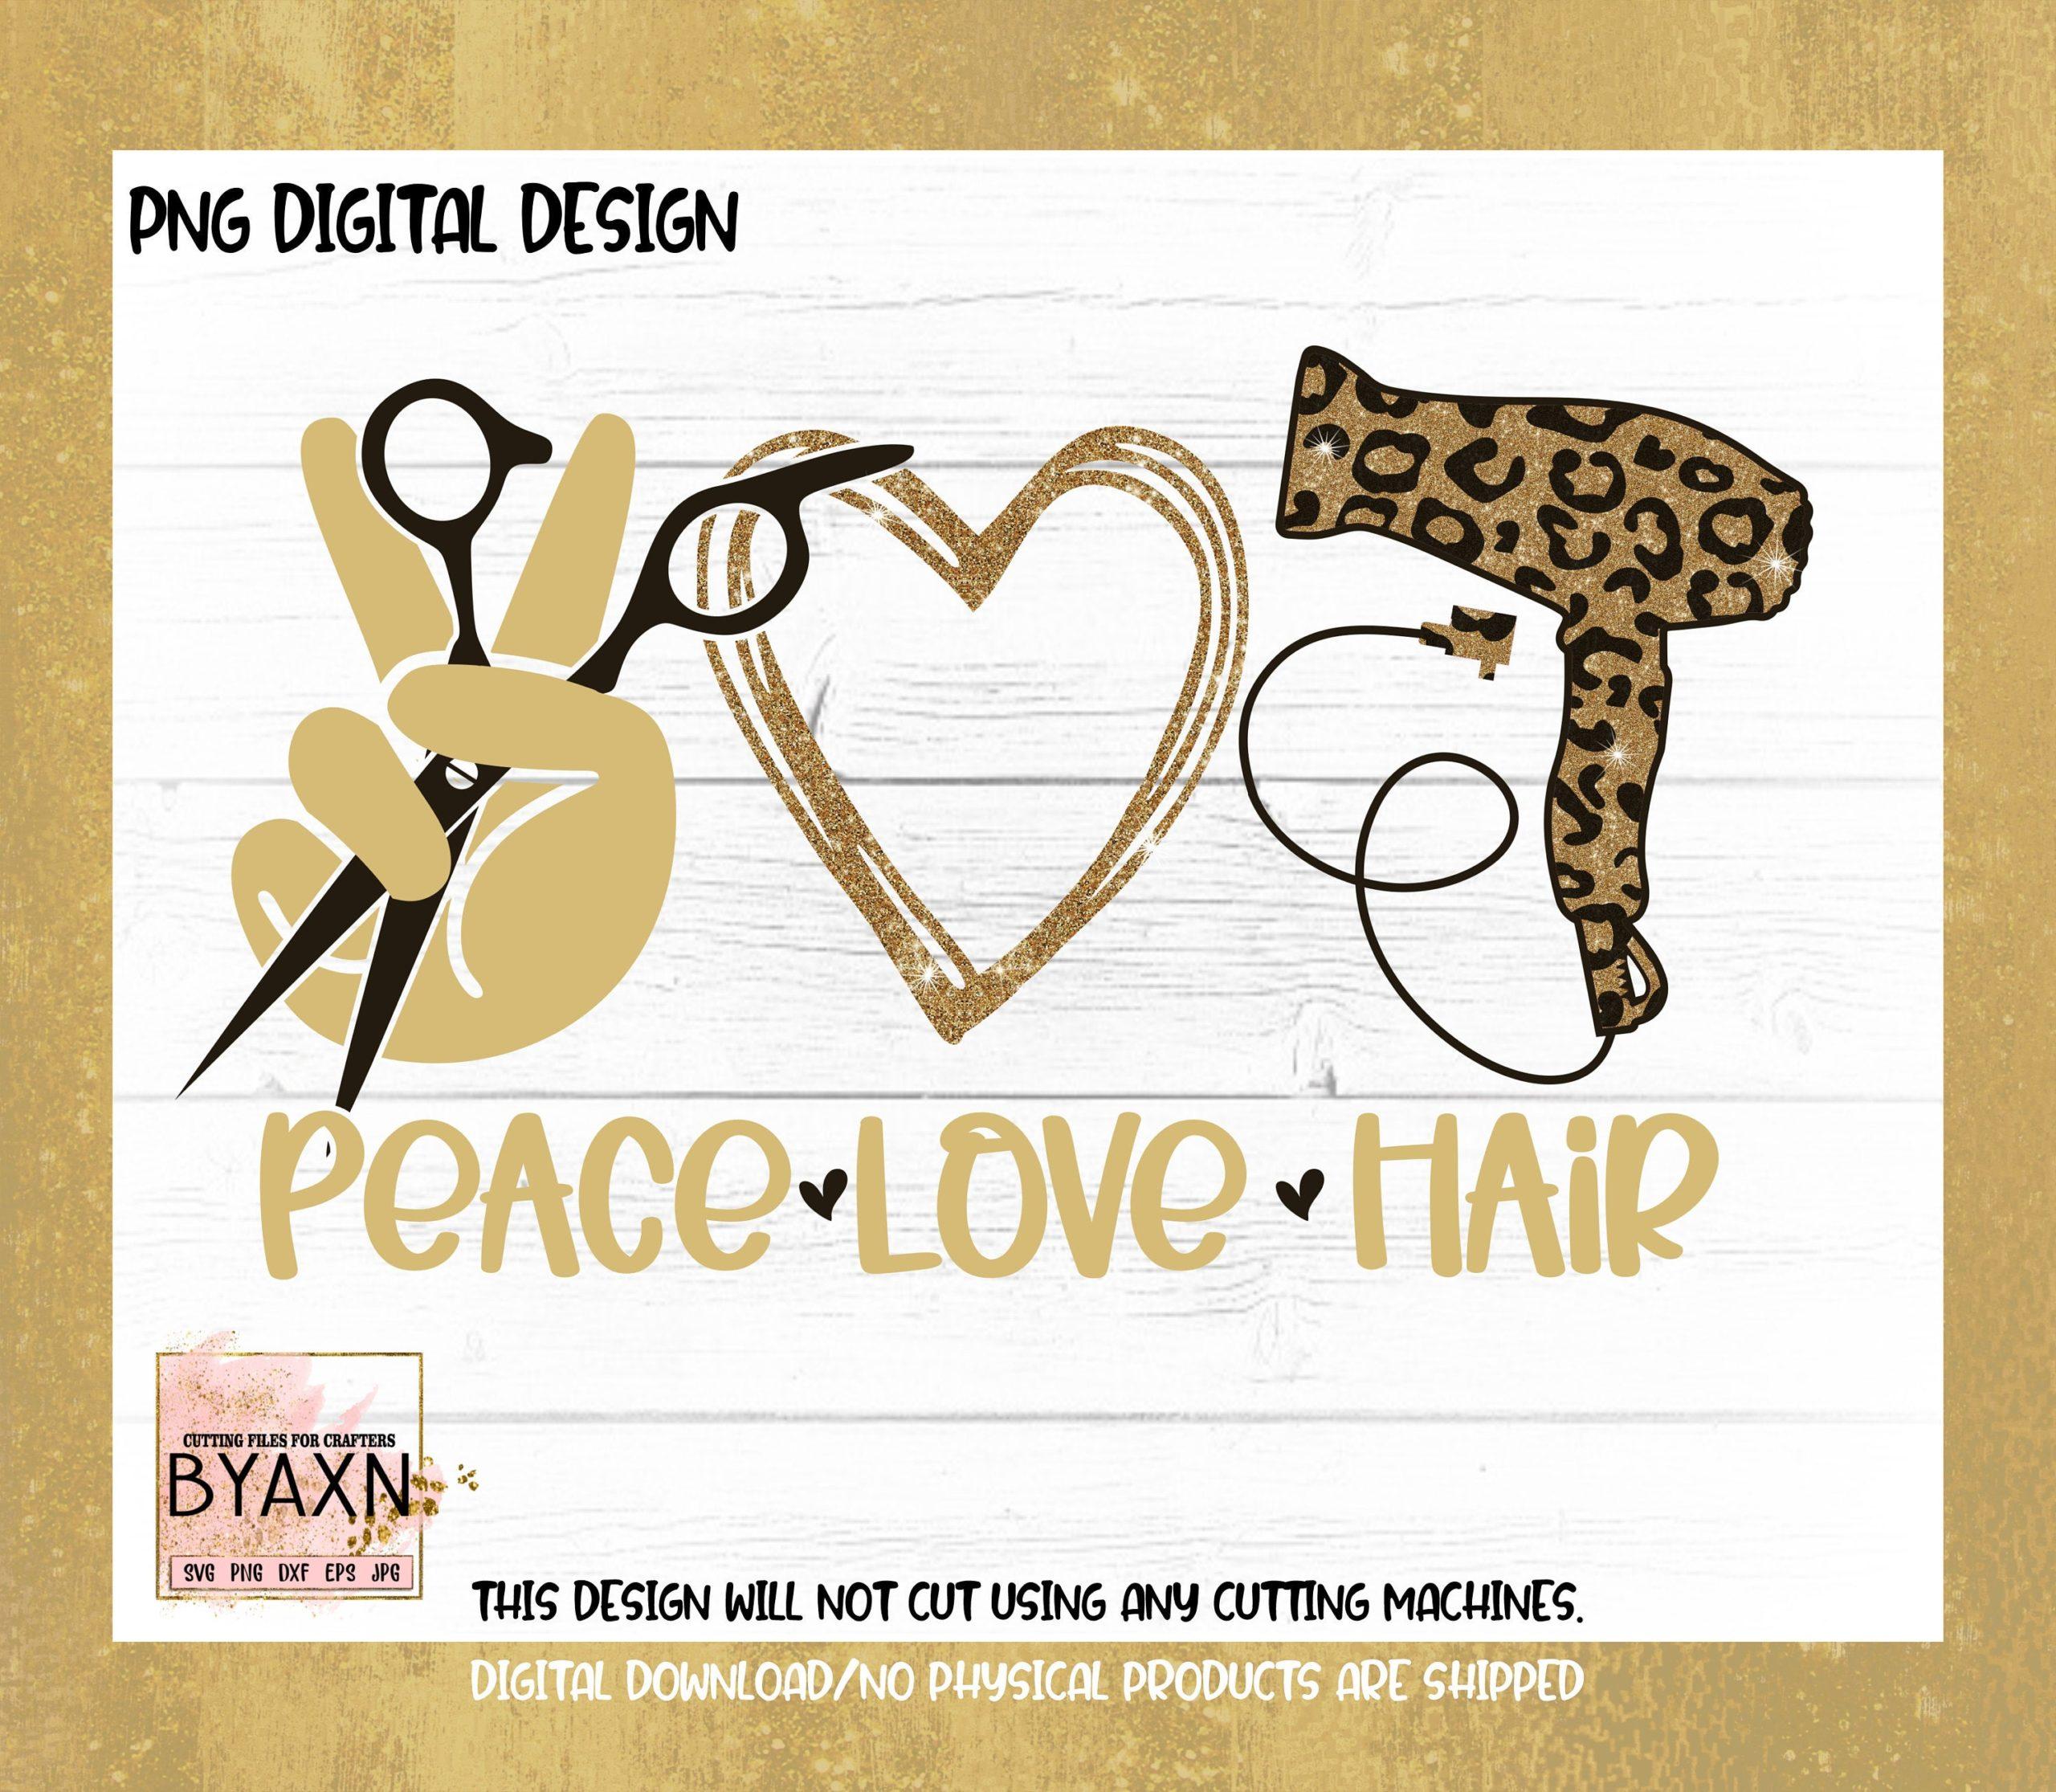 Peace-love-hair-png-printable-png-print-file-for-sublimation-png-sublimation-peace-love-png-sublimation-png-designs-png-designs-60514937